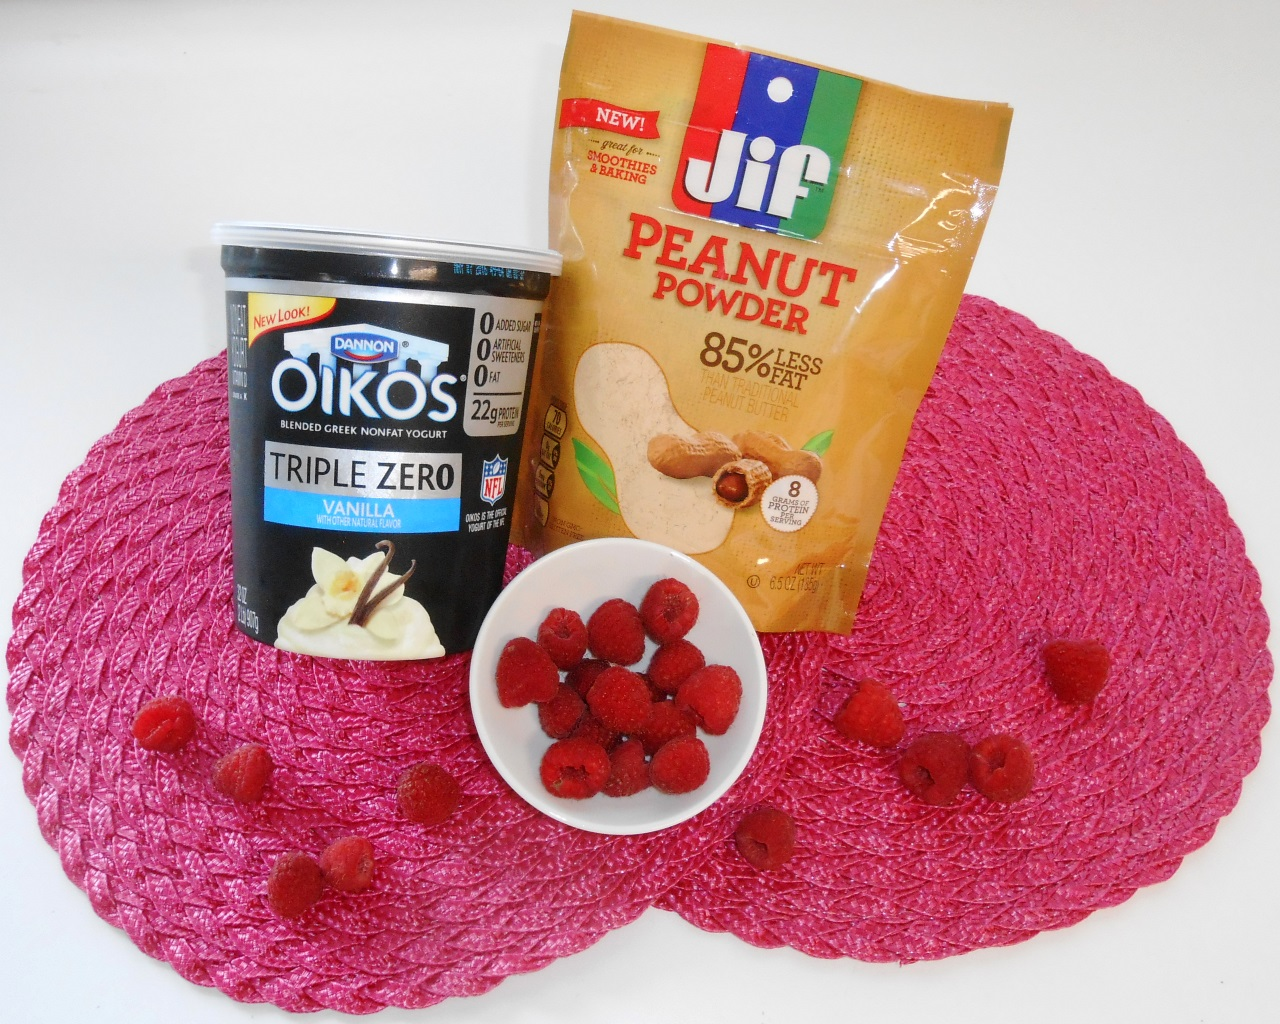 Oikos-Triple-Zero-Greek-Nonfat-Yogurt-Jif-Peanut-Powder-Raspberries-Ibotta